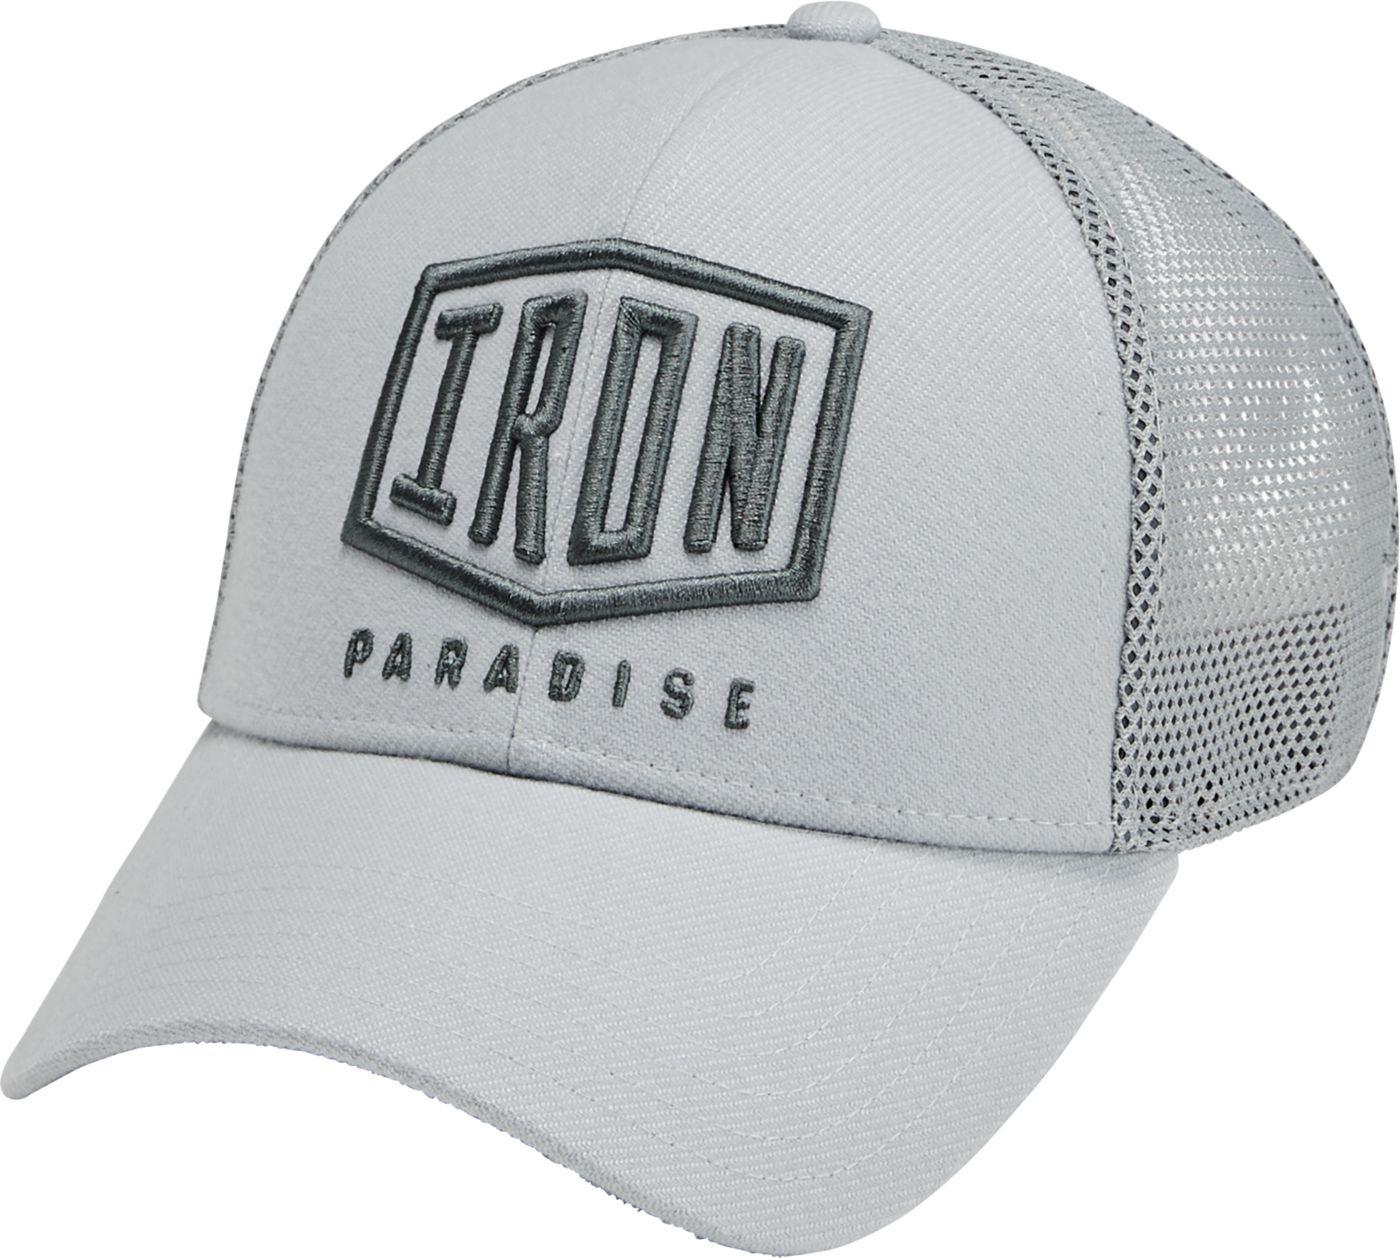 Under Armour Men's Project Rock Strength Trucker Hat